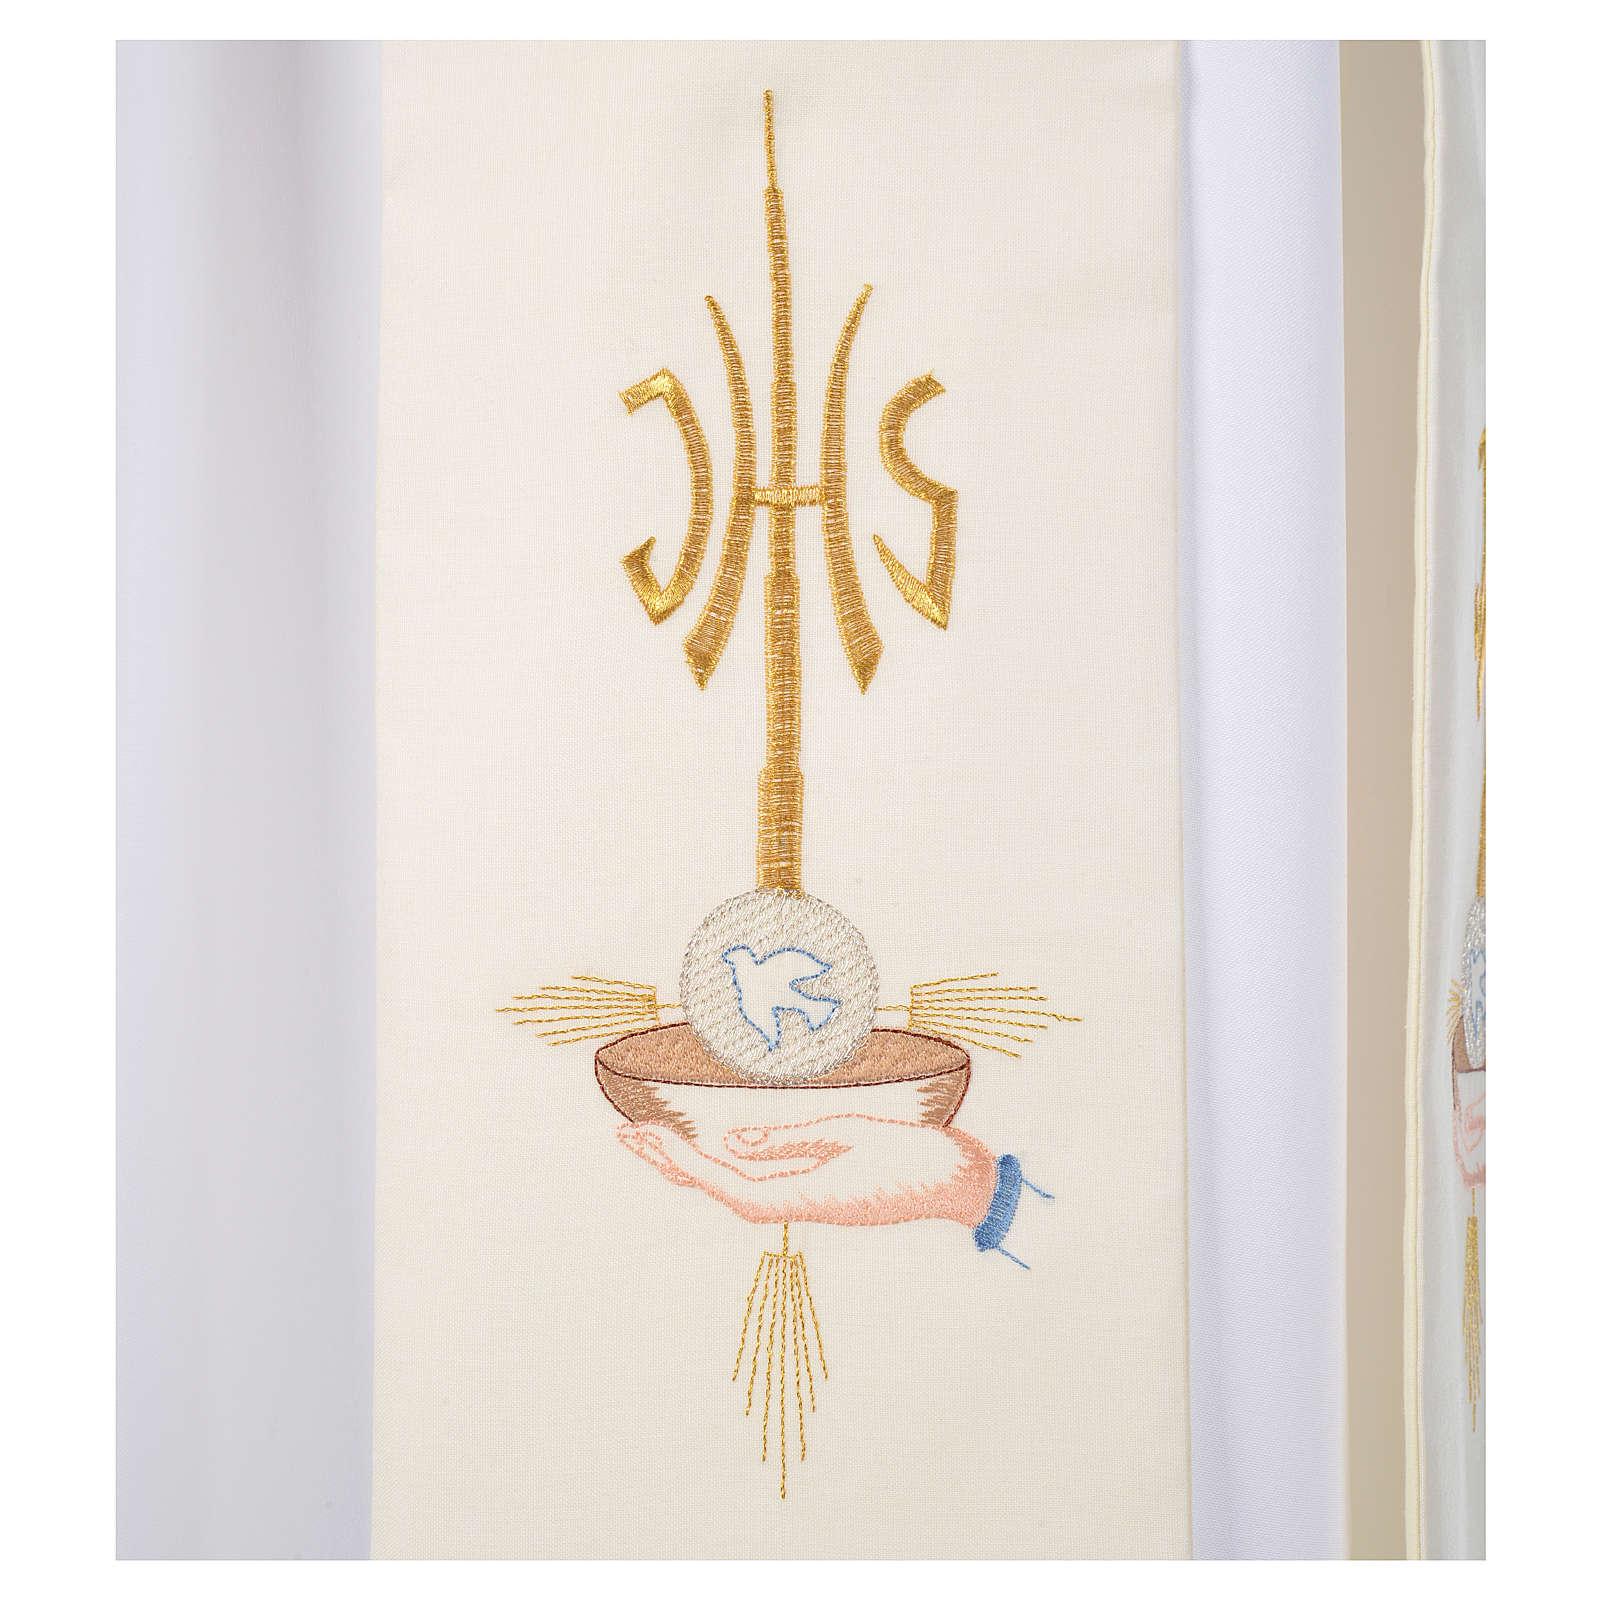 Diacon stole hands paten host and dove, JHS symbol 4